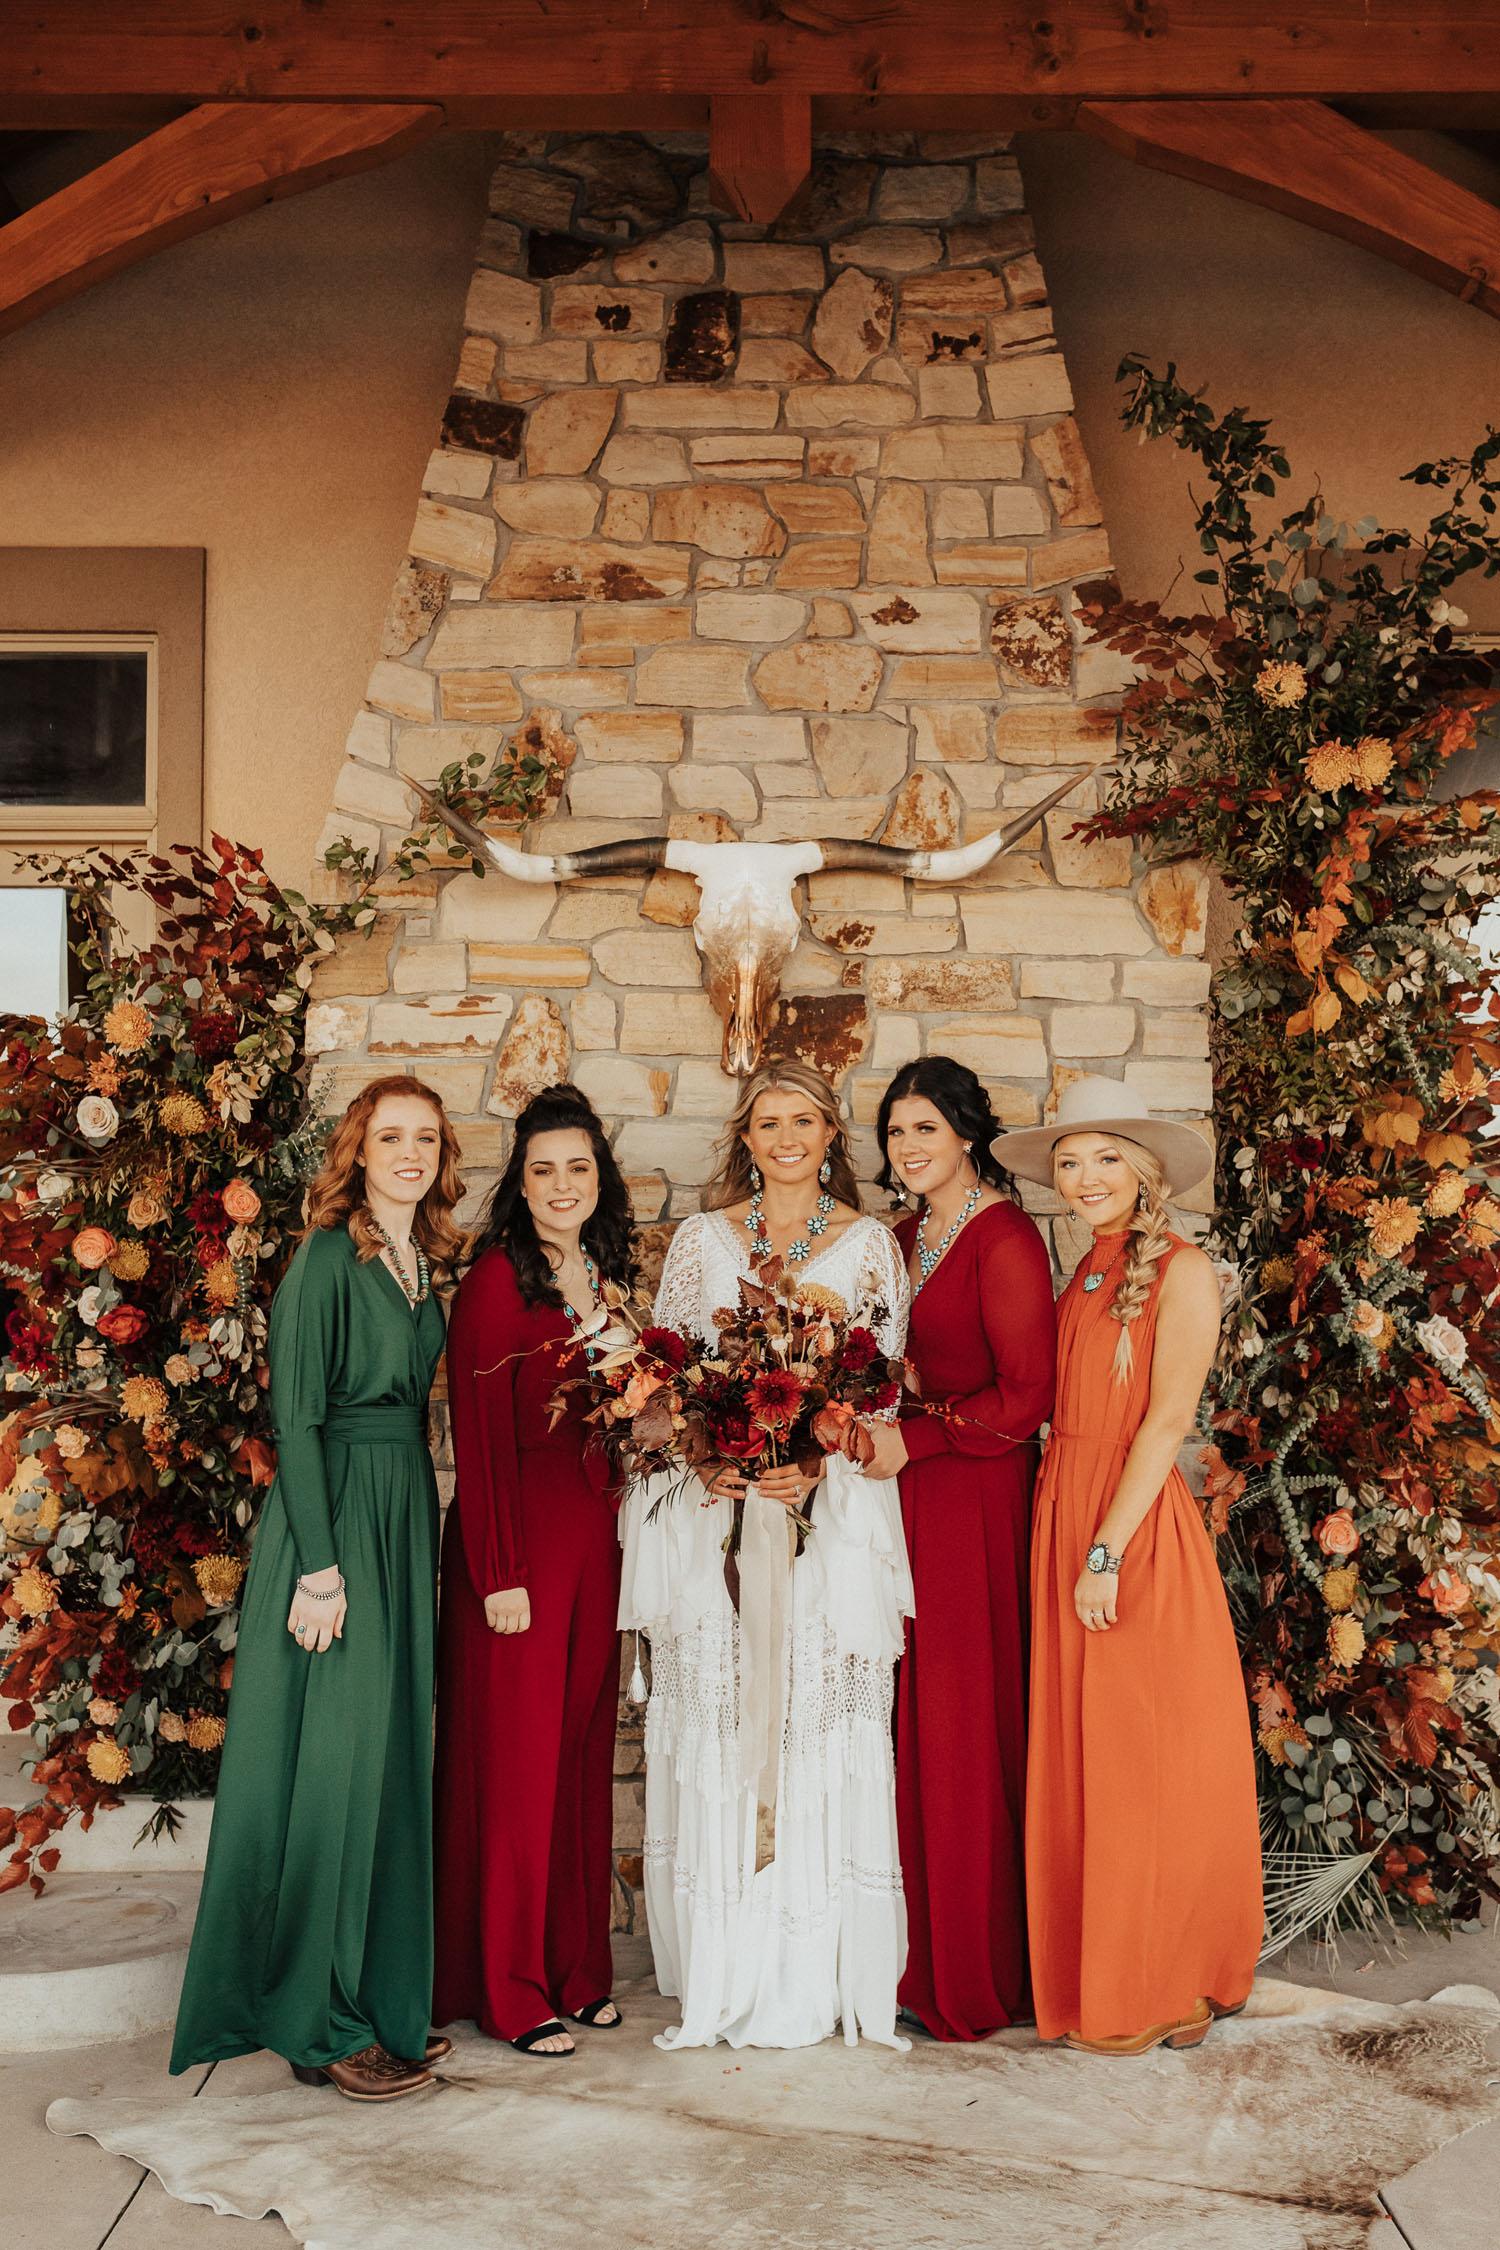 boho bride and bridesmaids in fall colors